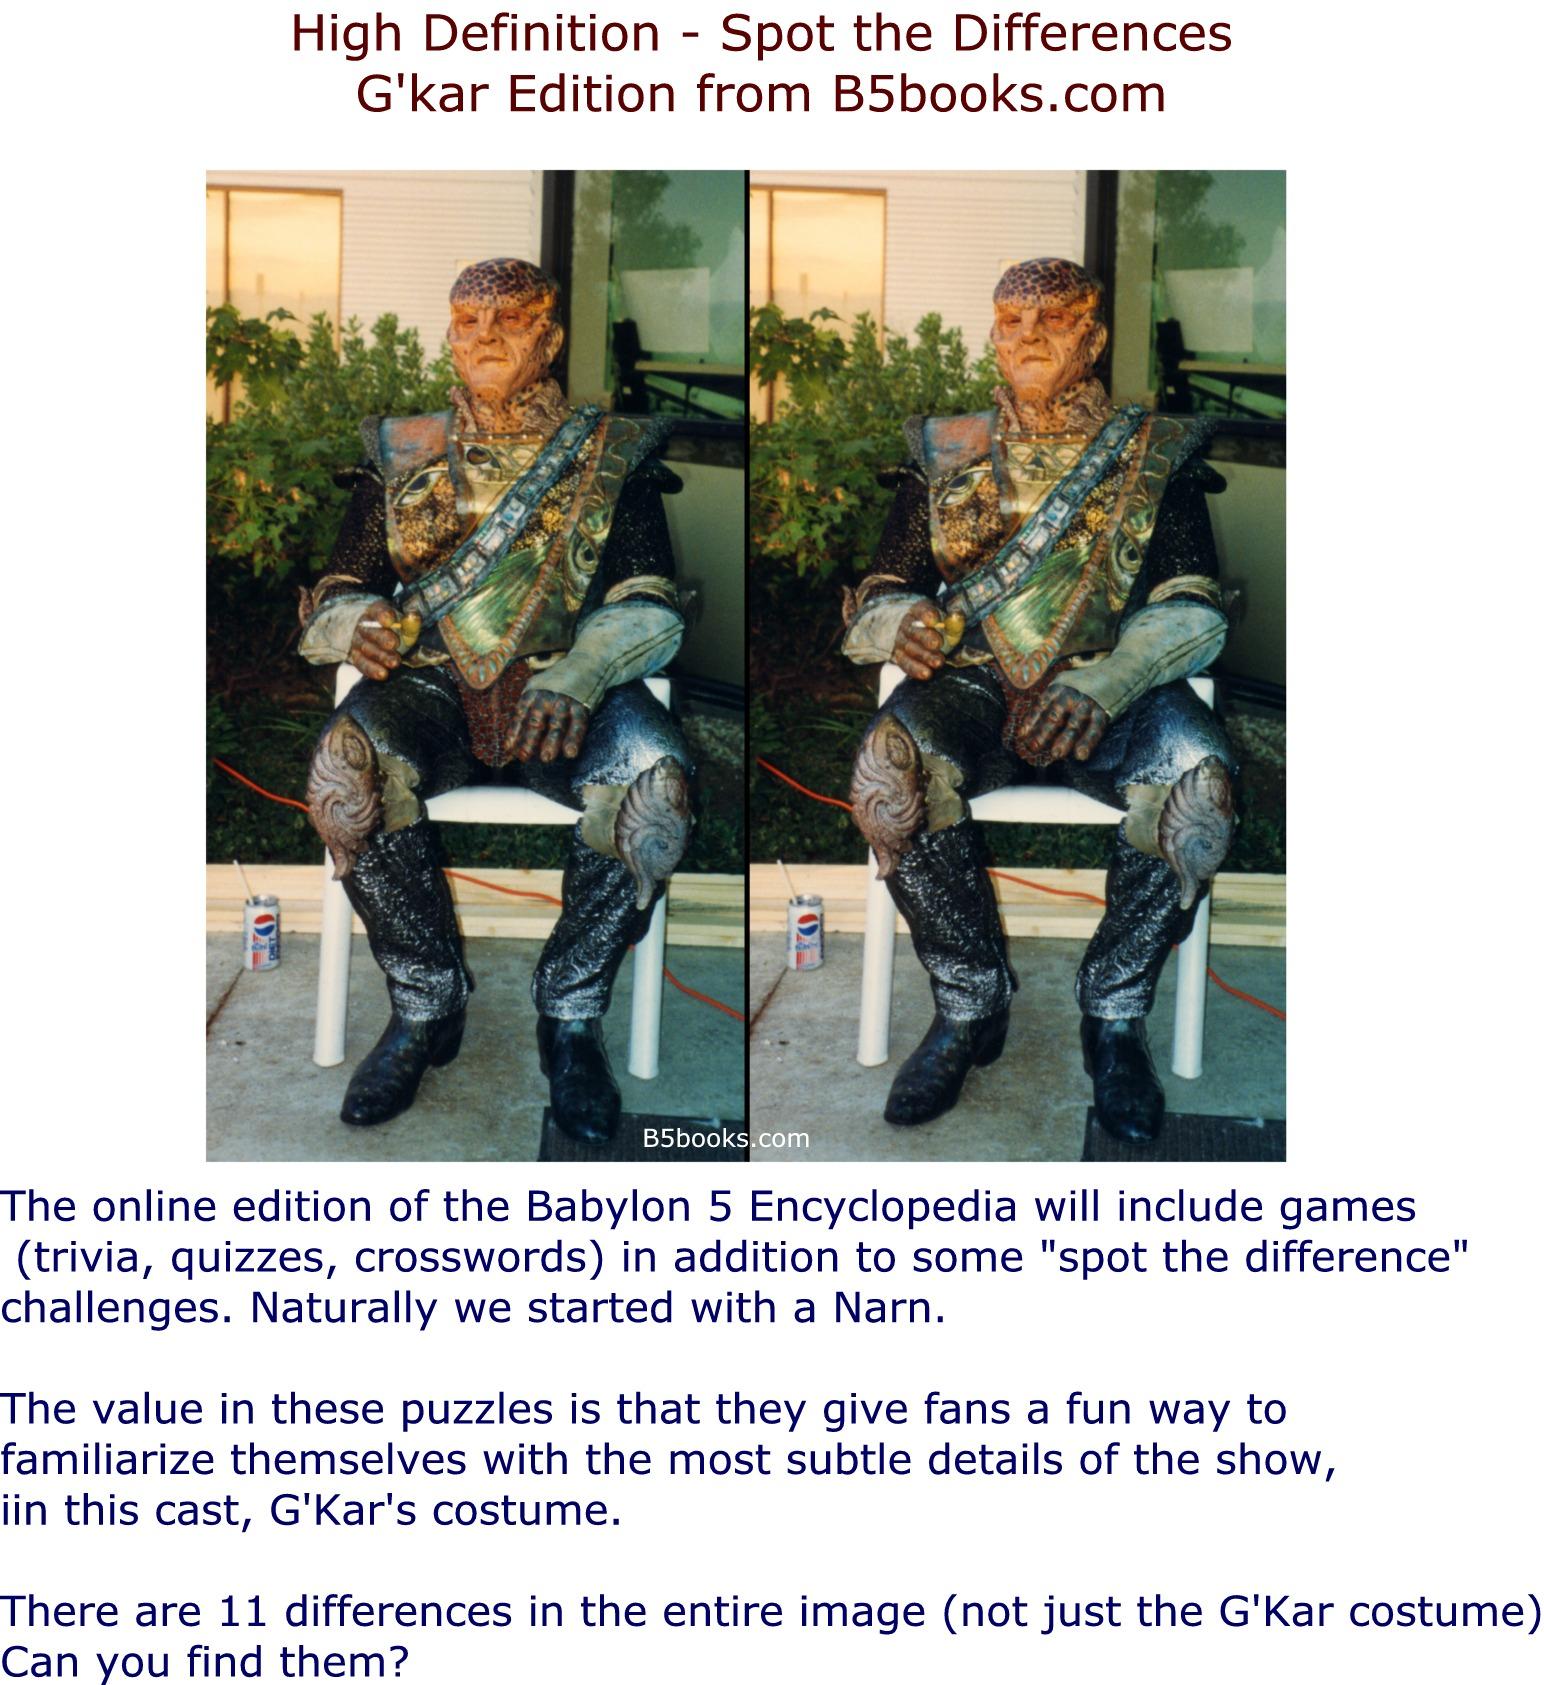 HD Gkar Spot the Differences Babylon 5 Encyclopedia